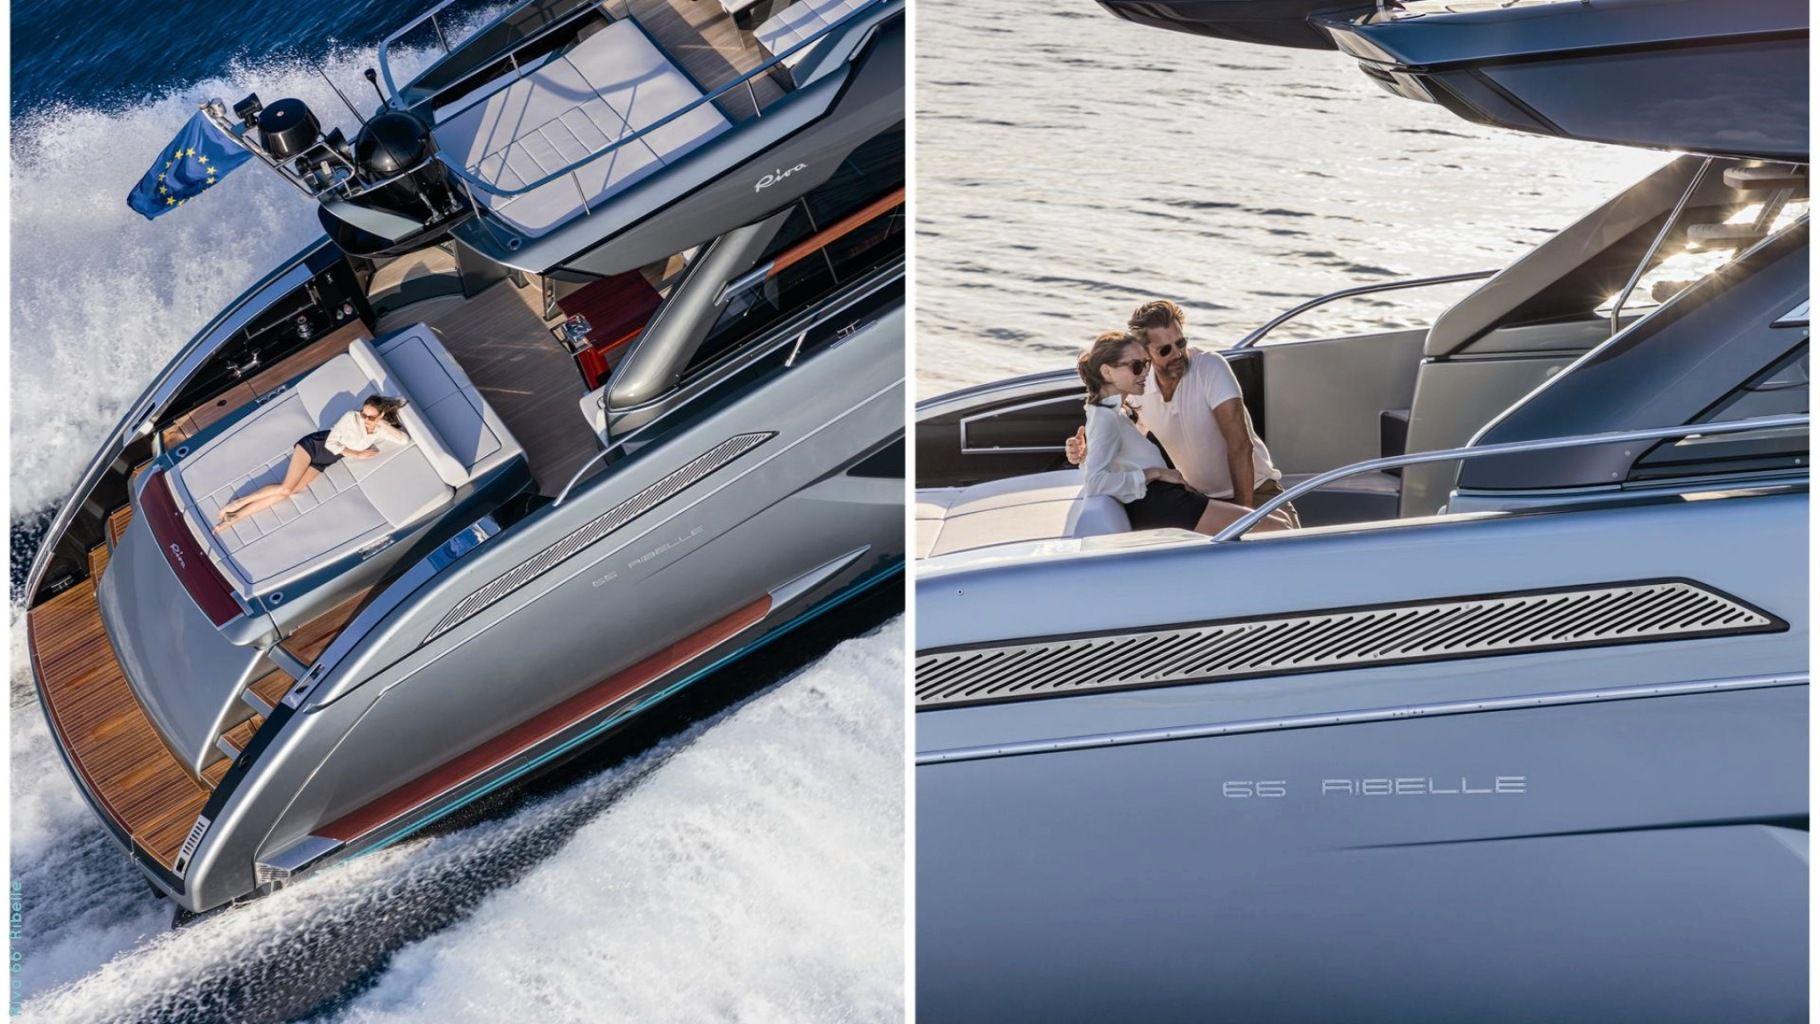 gertjan_2019_riva_yachts_Gertjan H Best Age Model Spain.